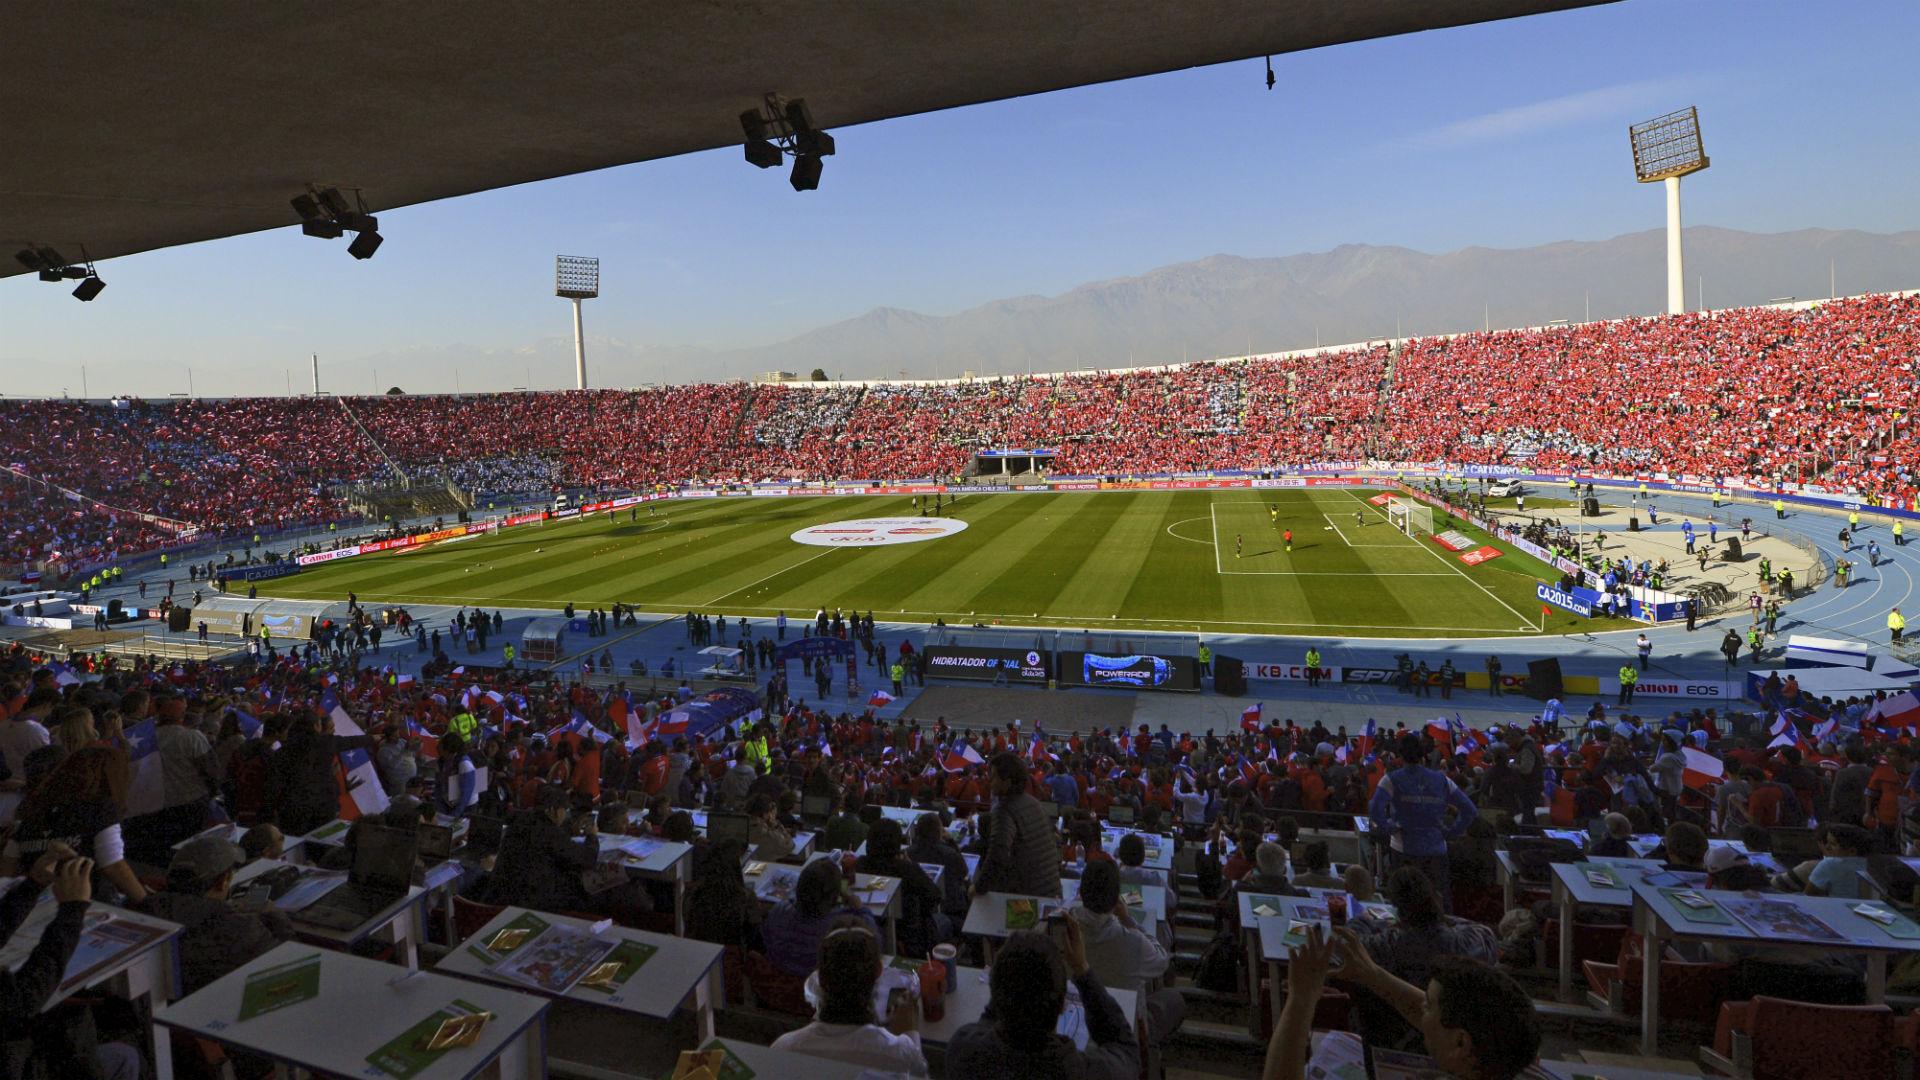 Conmebol convoca a River Plate y Flamengo por la Copa Libertadores